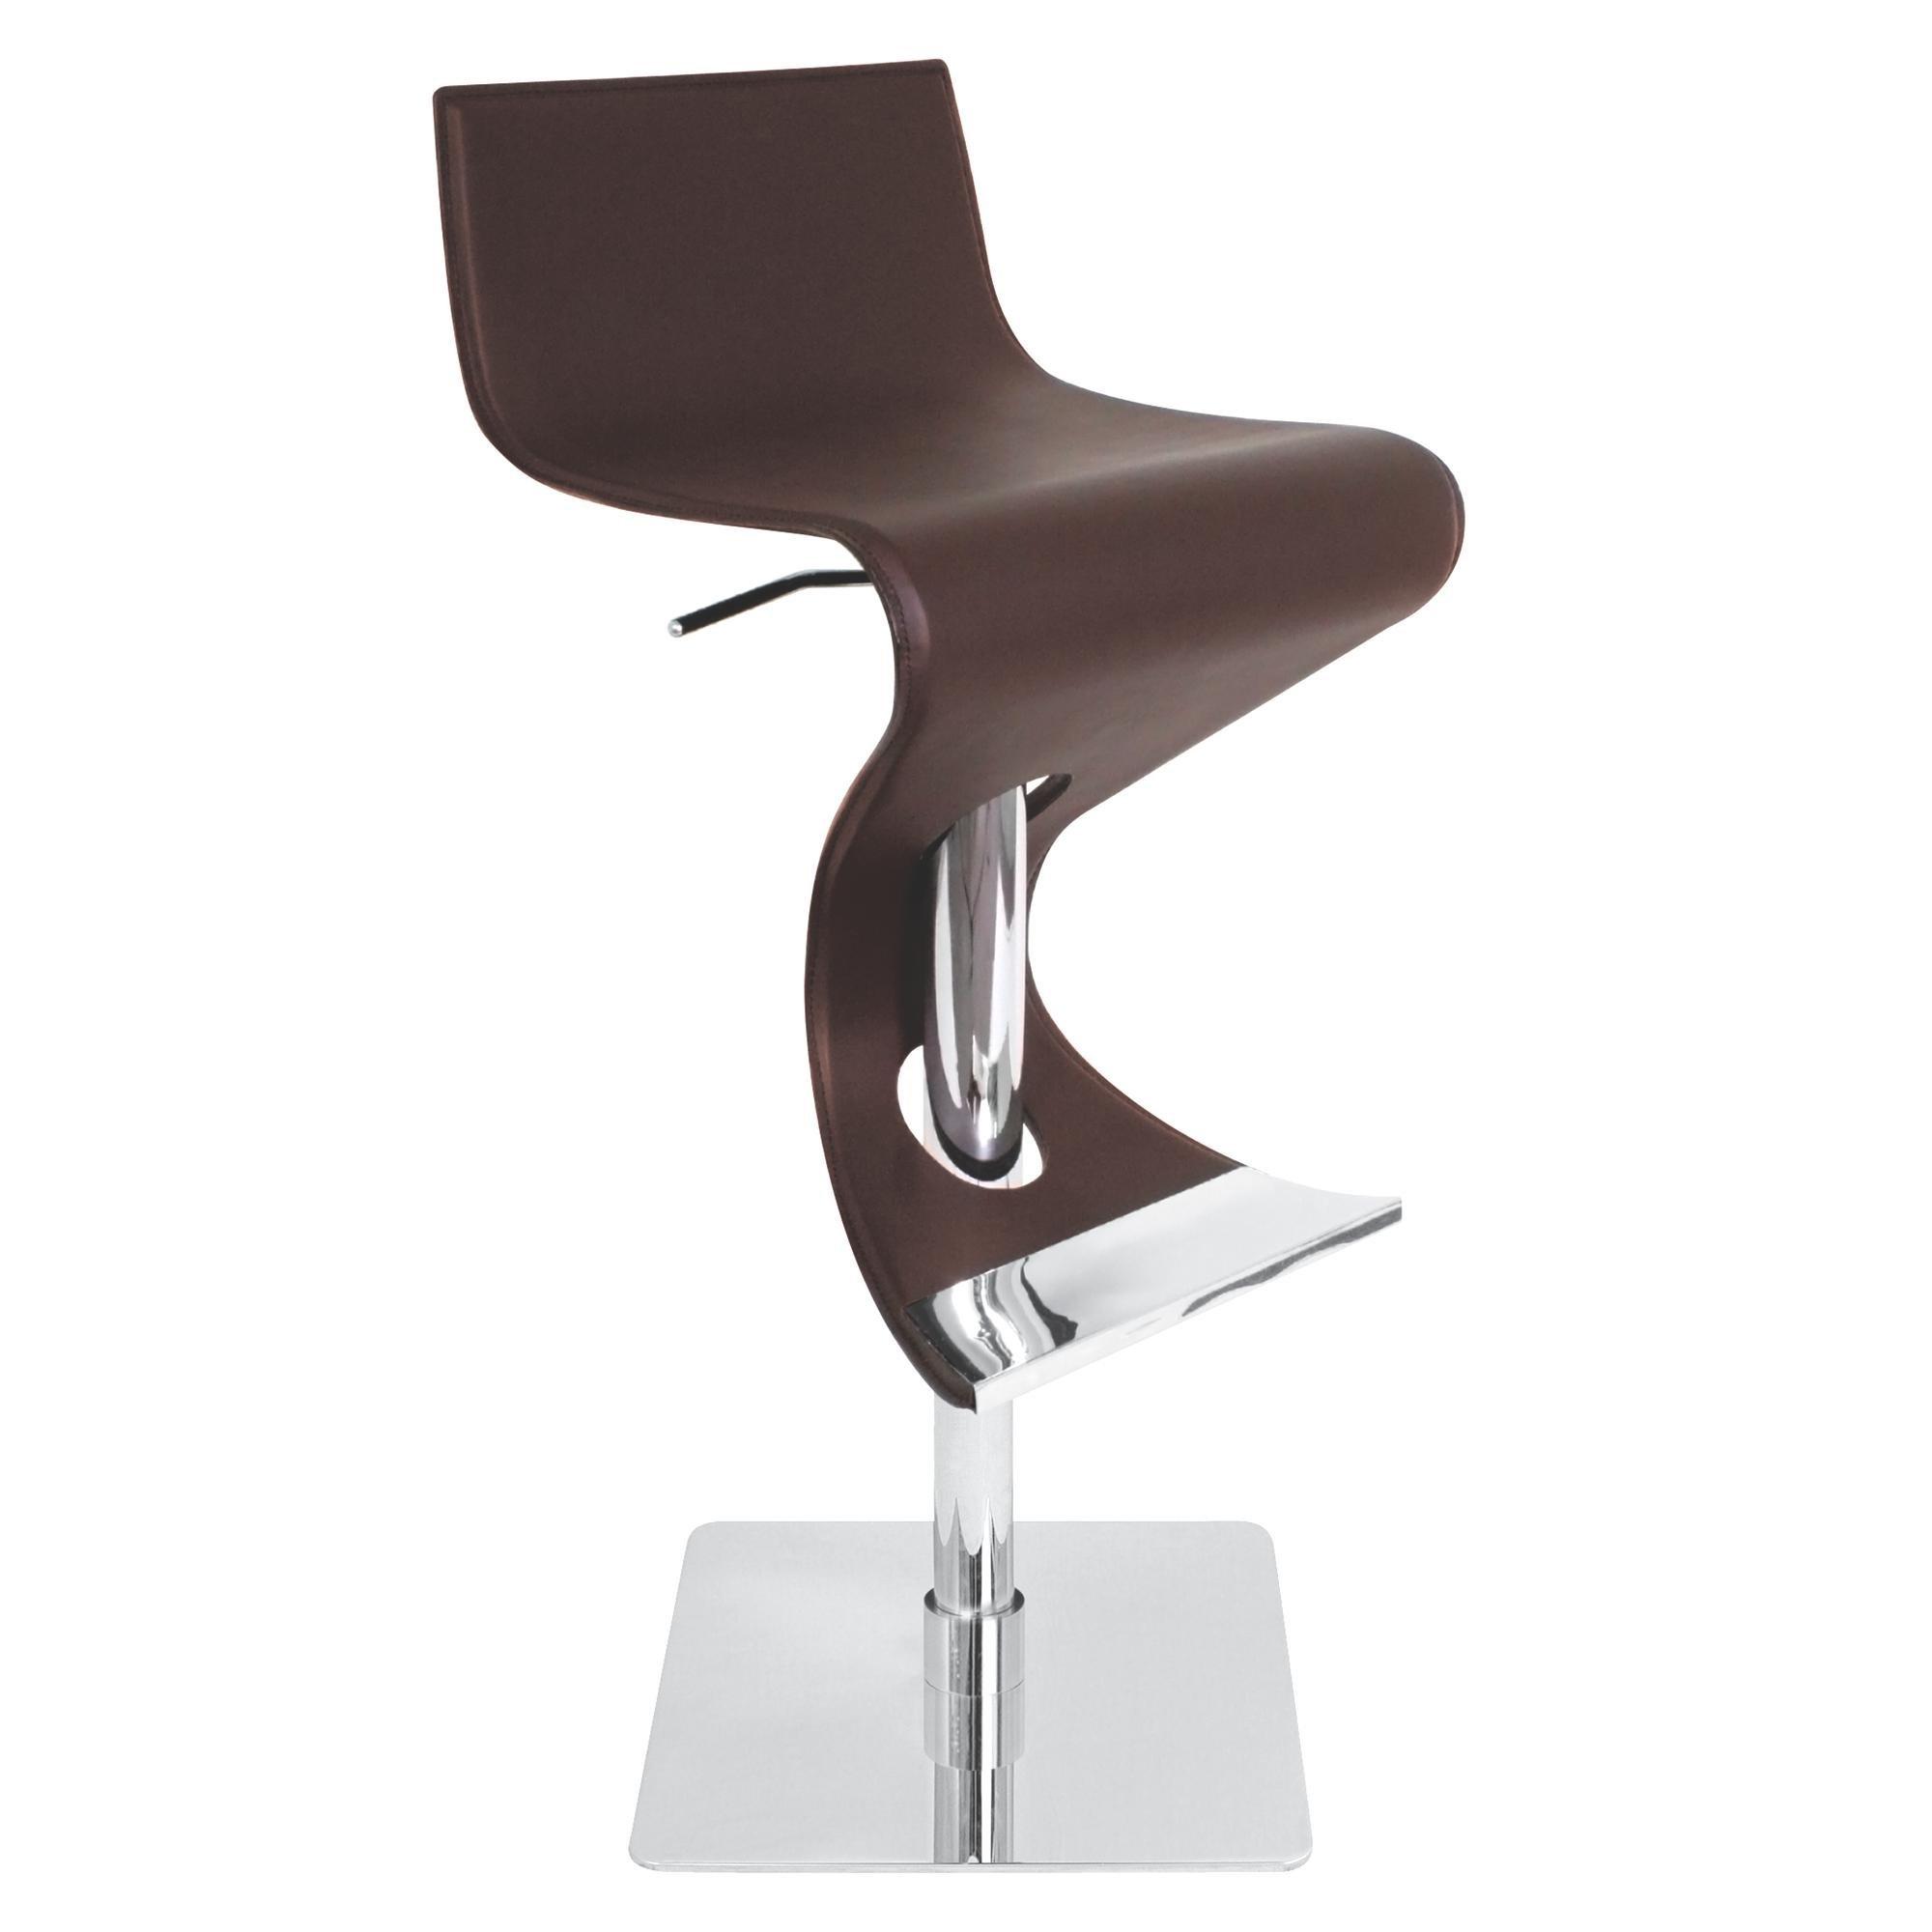 Lumisource Viva Height with Swivel Adjustable Barstool, Brown